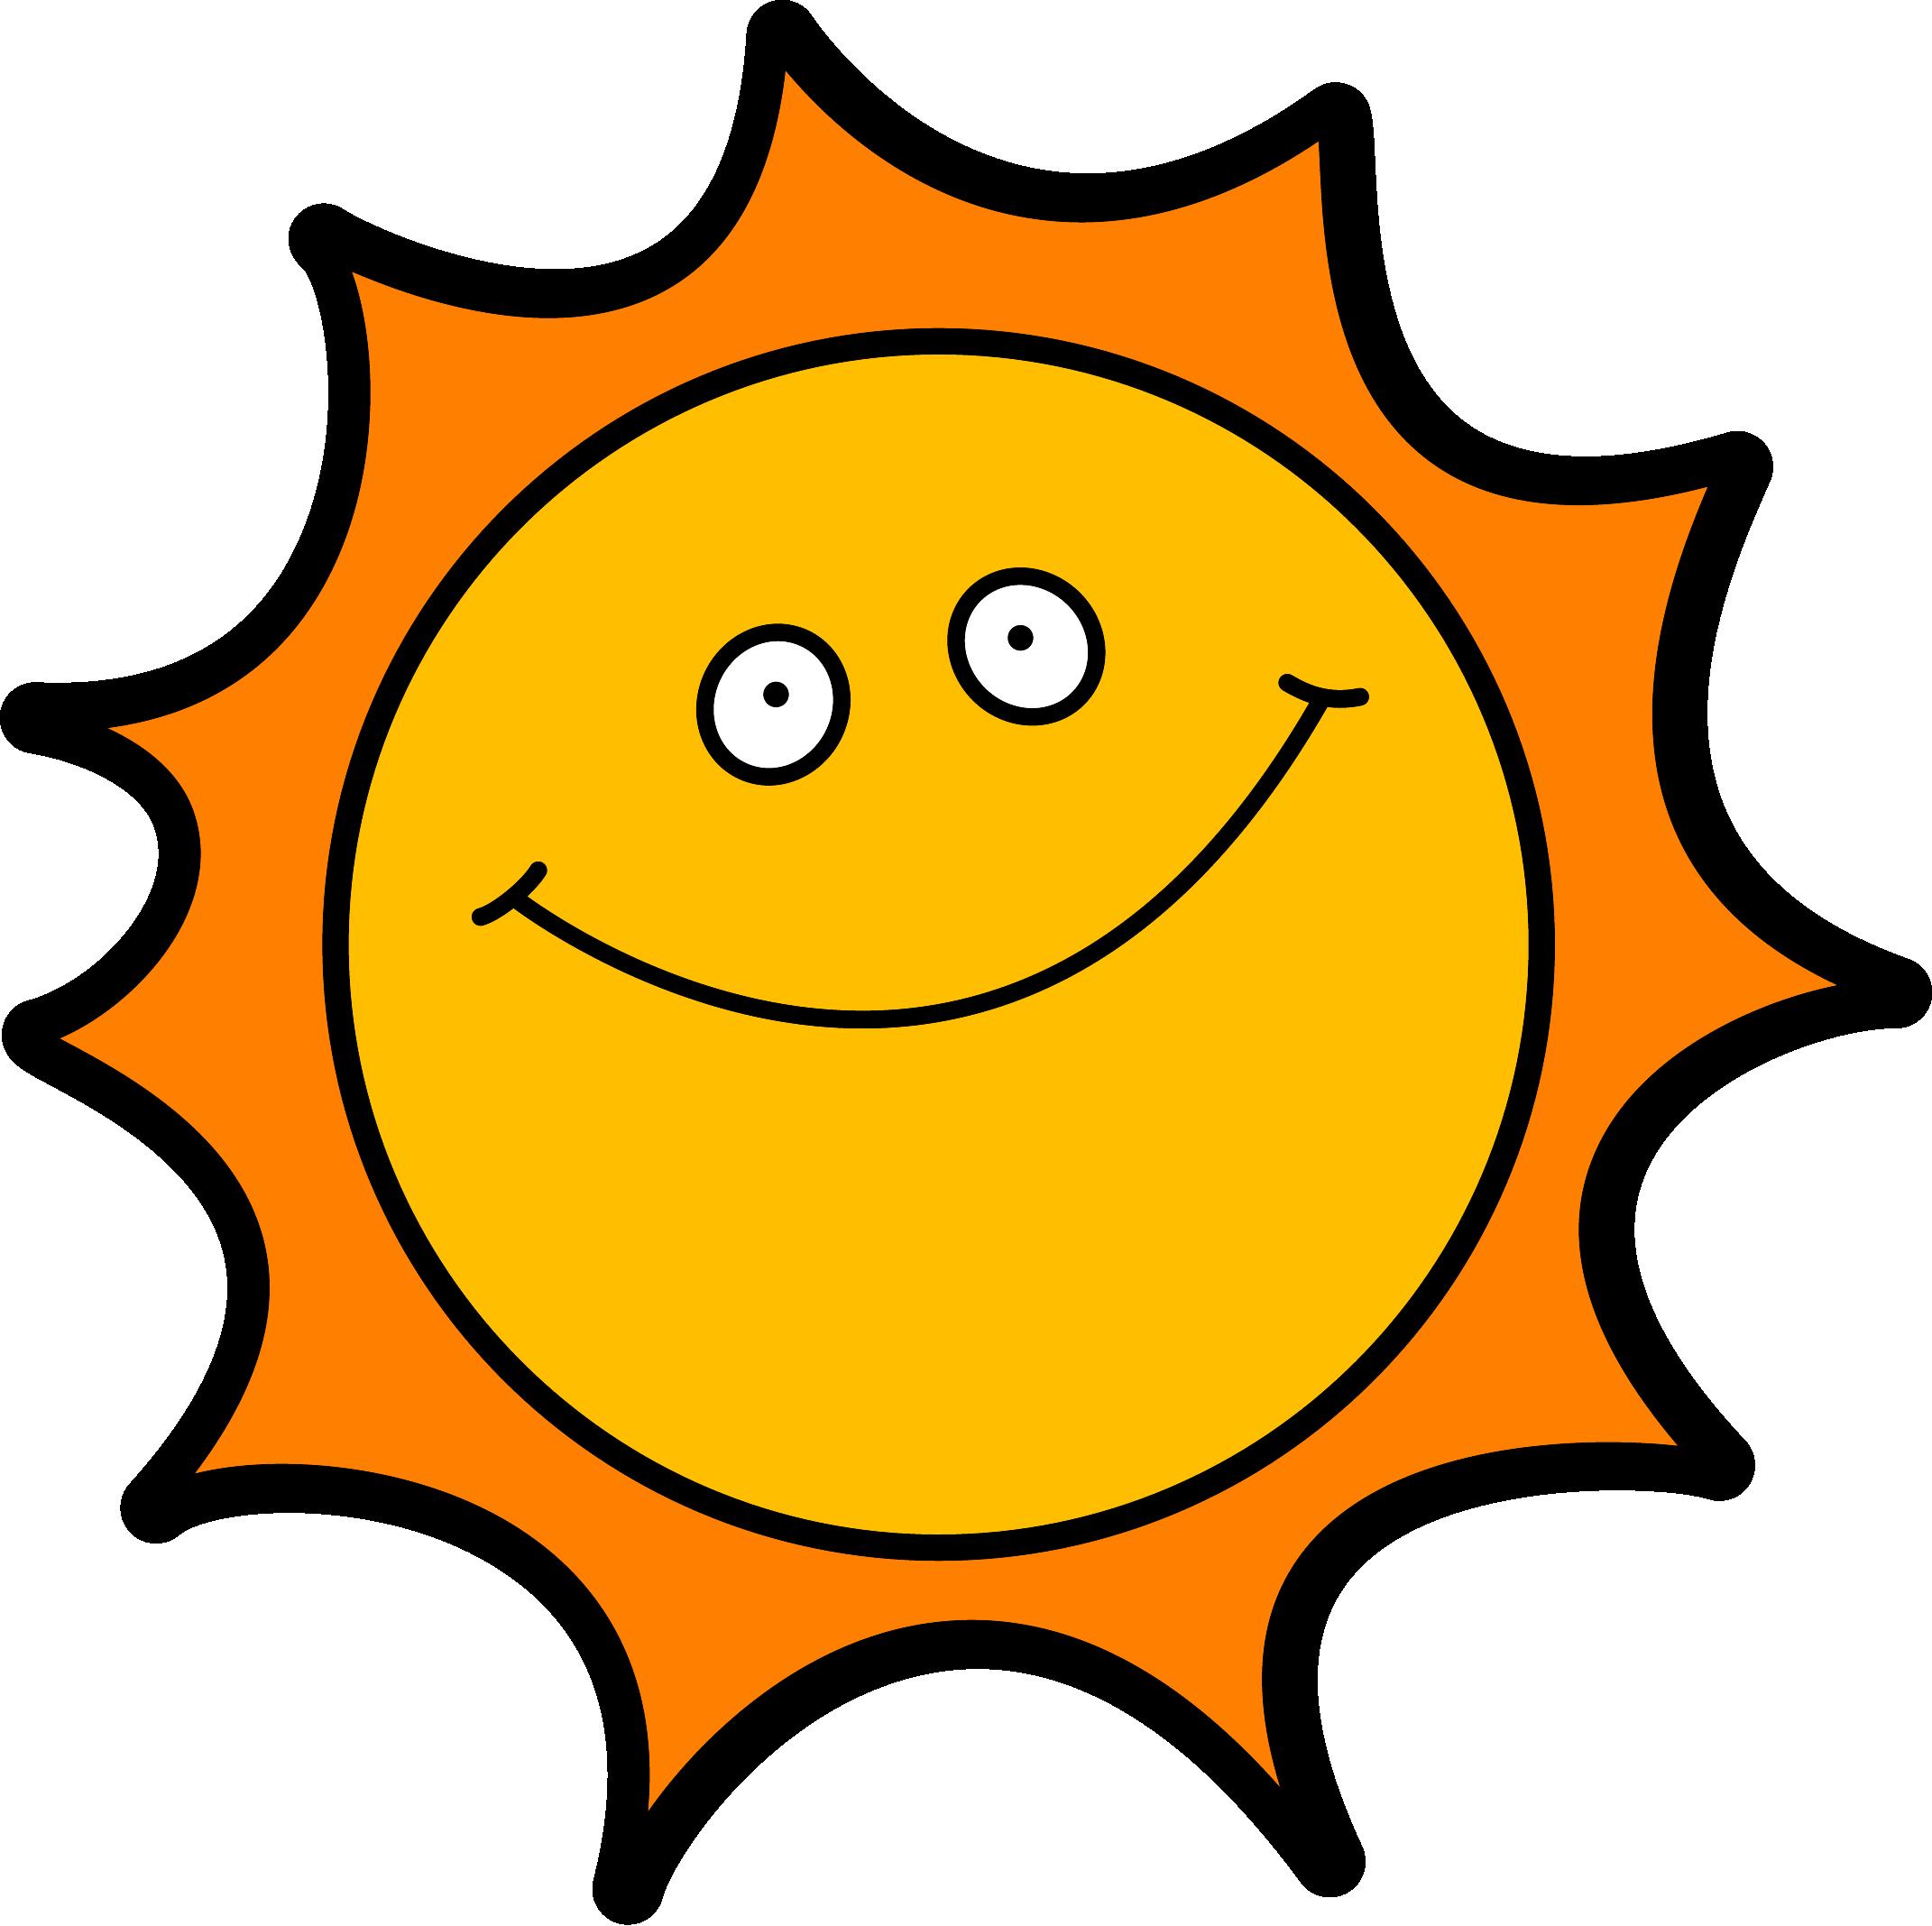 2142x2135 Sunshine Free Sun Clipart Public Domain Sun Clip Art Images And 5